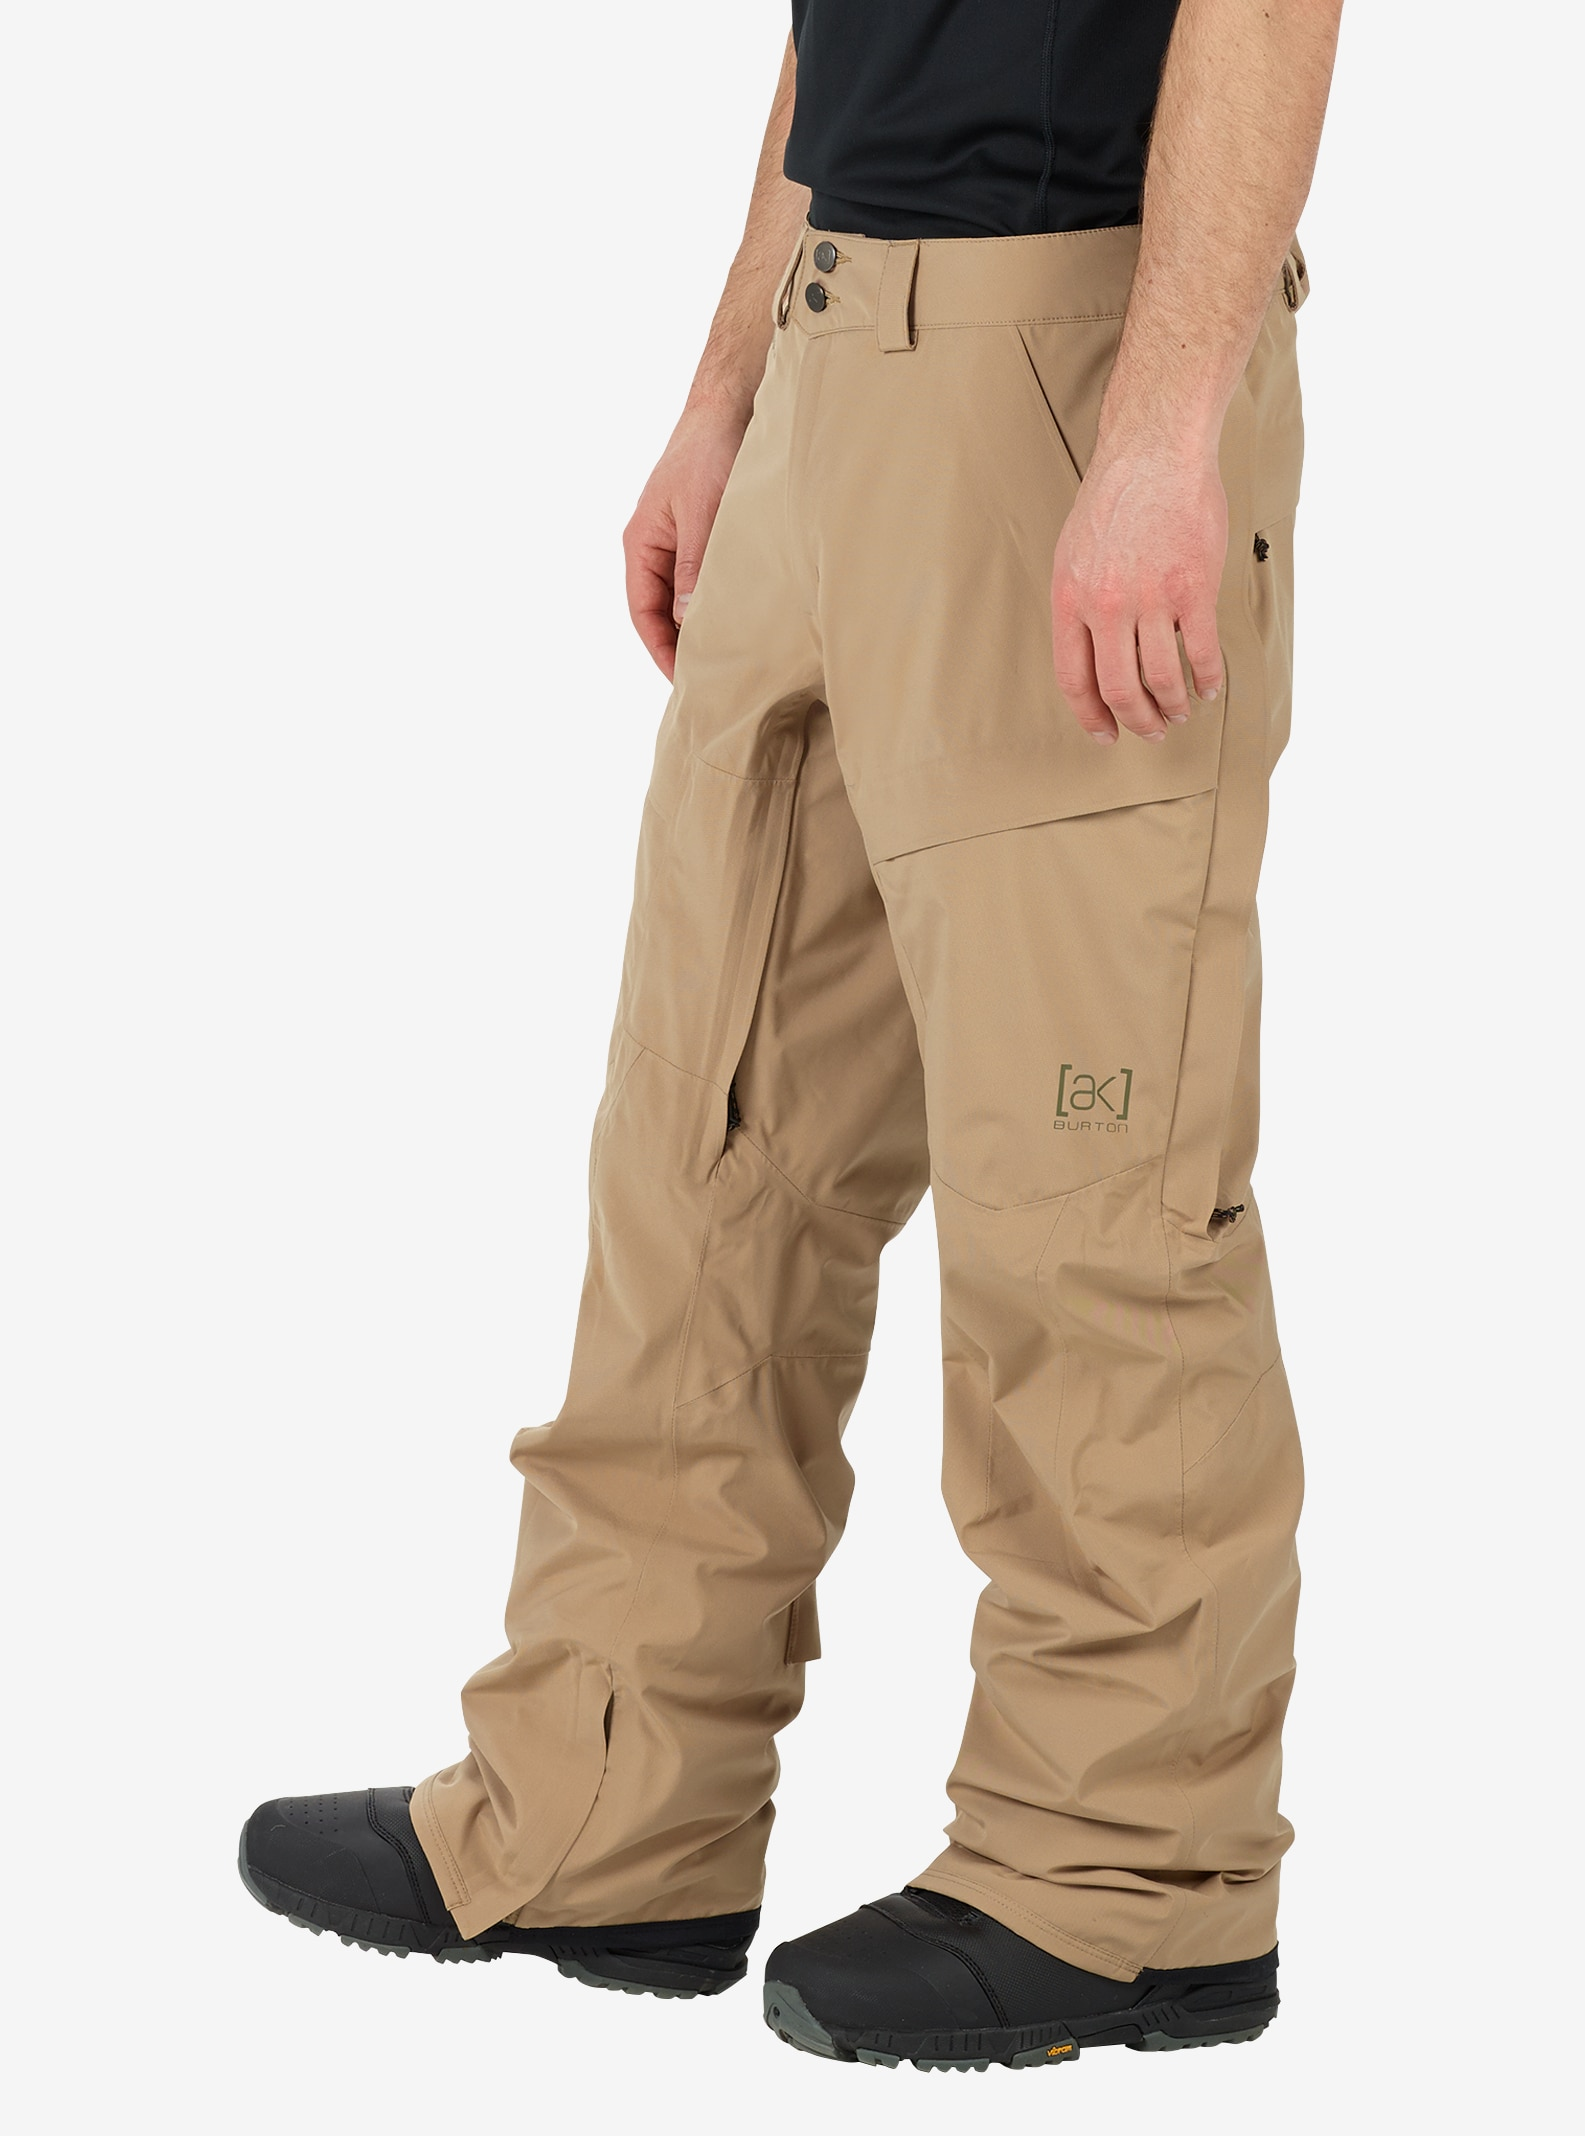 Men's Burton [ak] GORE‑TEX® Swash Pant shown in Kelp